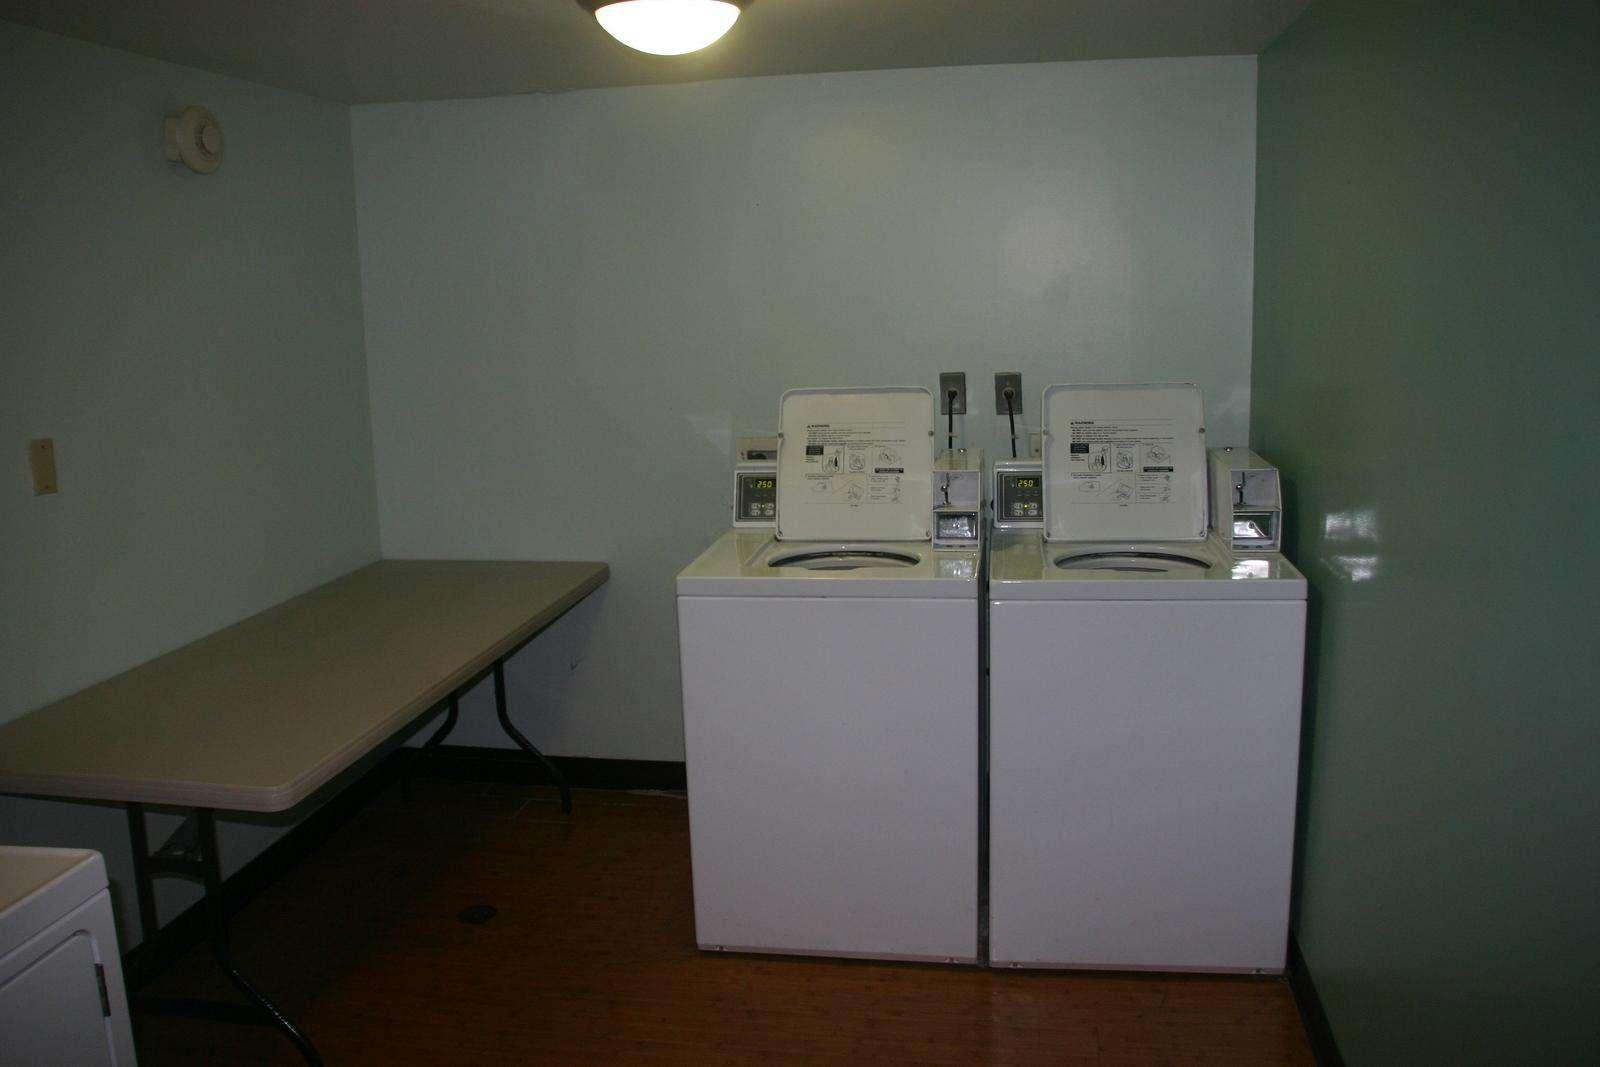 Laundry room on each floor.